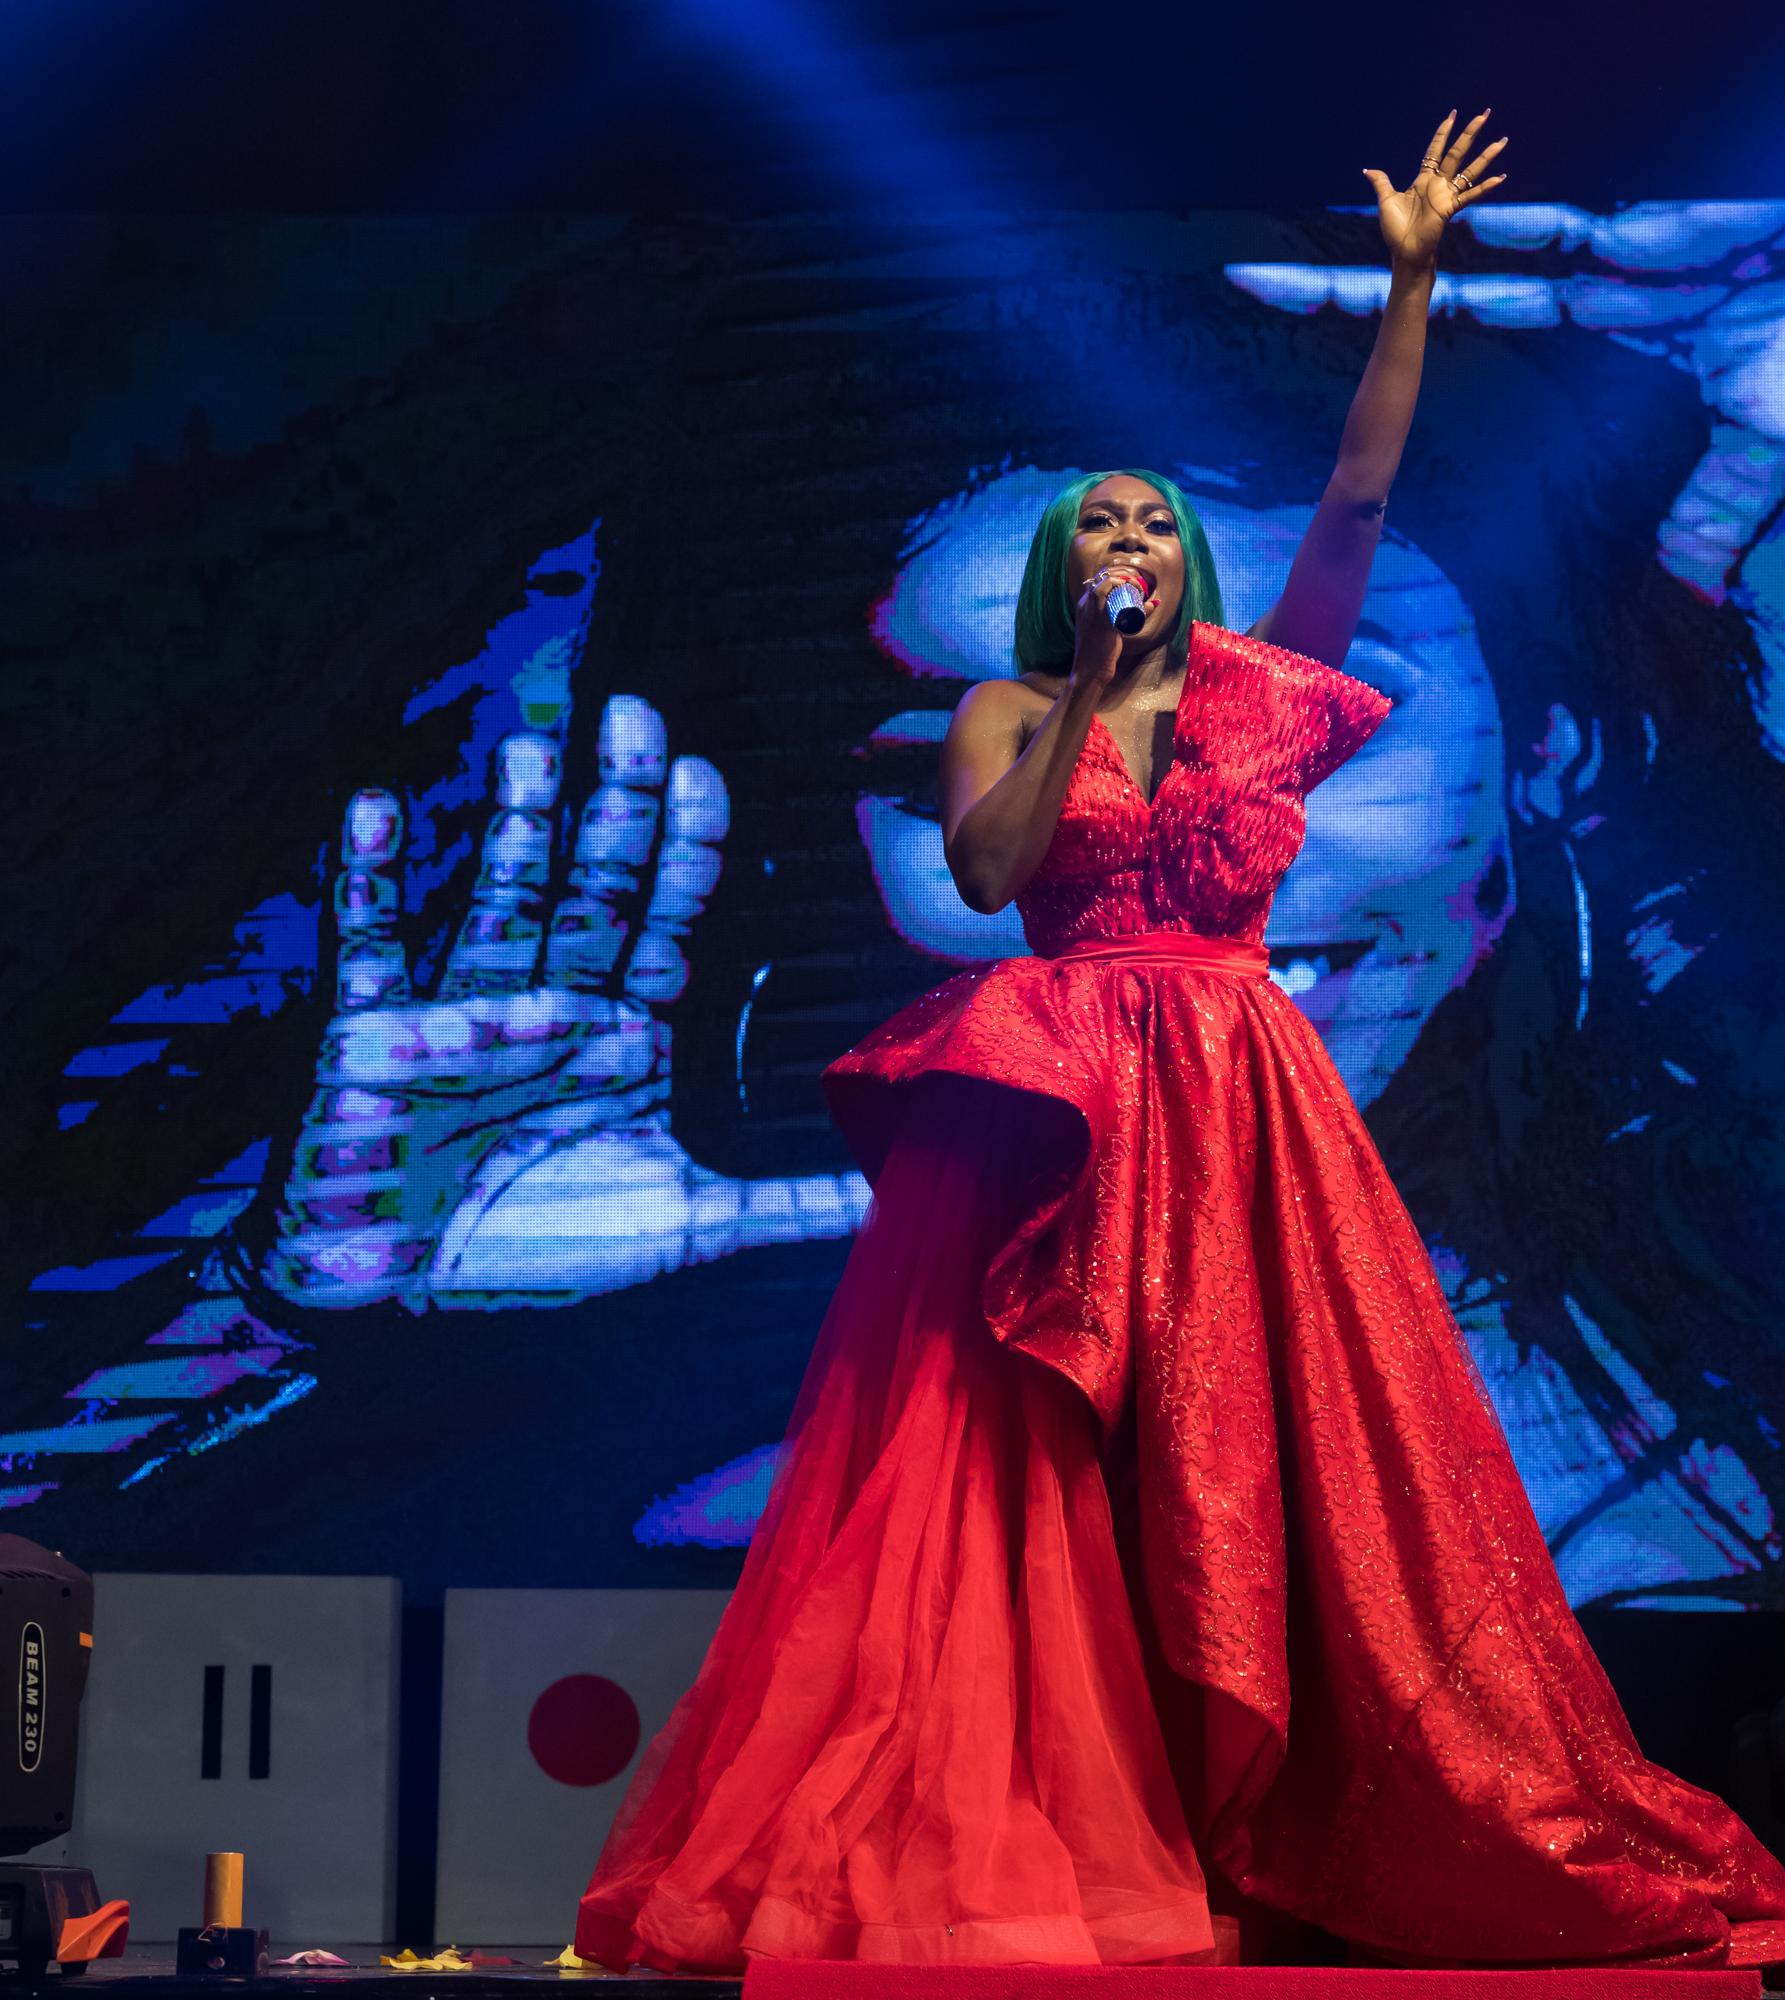 Lagos, Nigeria. 9th November 2018.  Niniola performs at her Human Radio Concert. Photographed by Michael Tubes